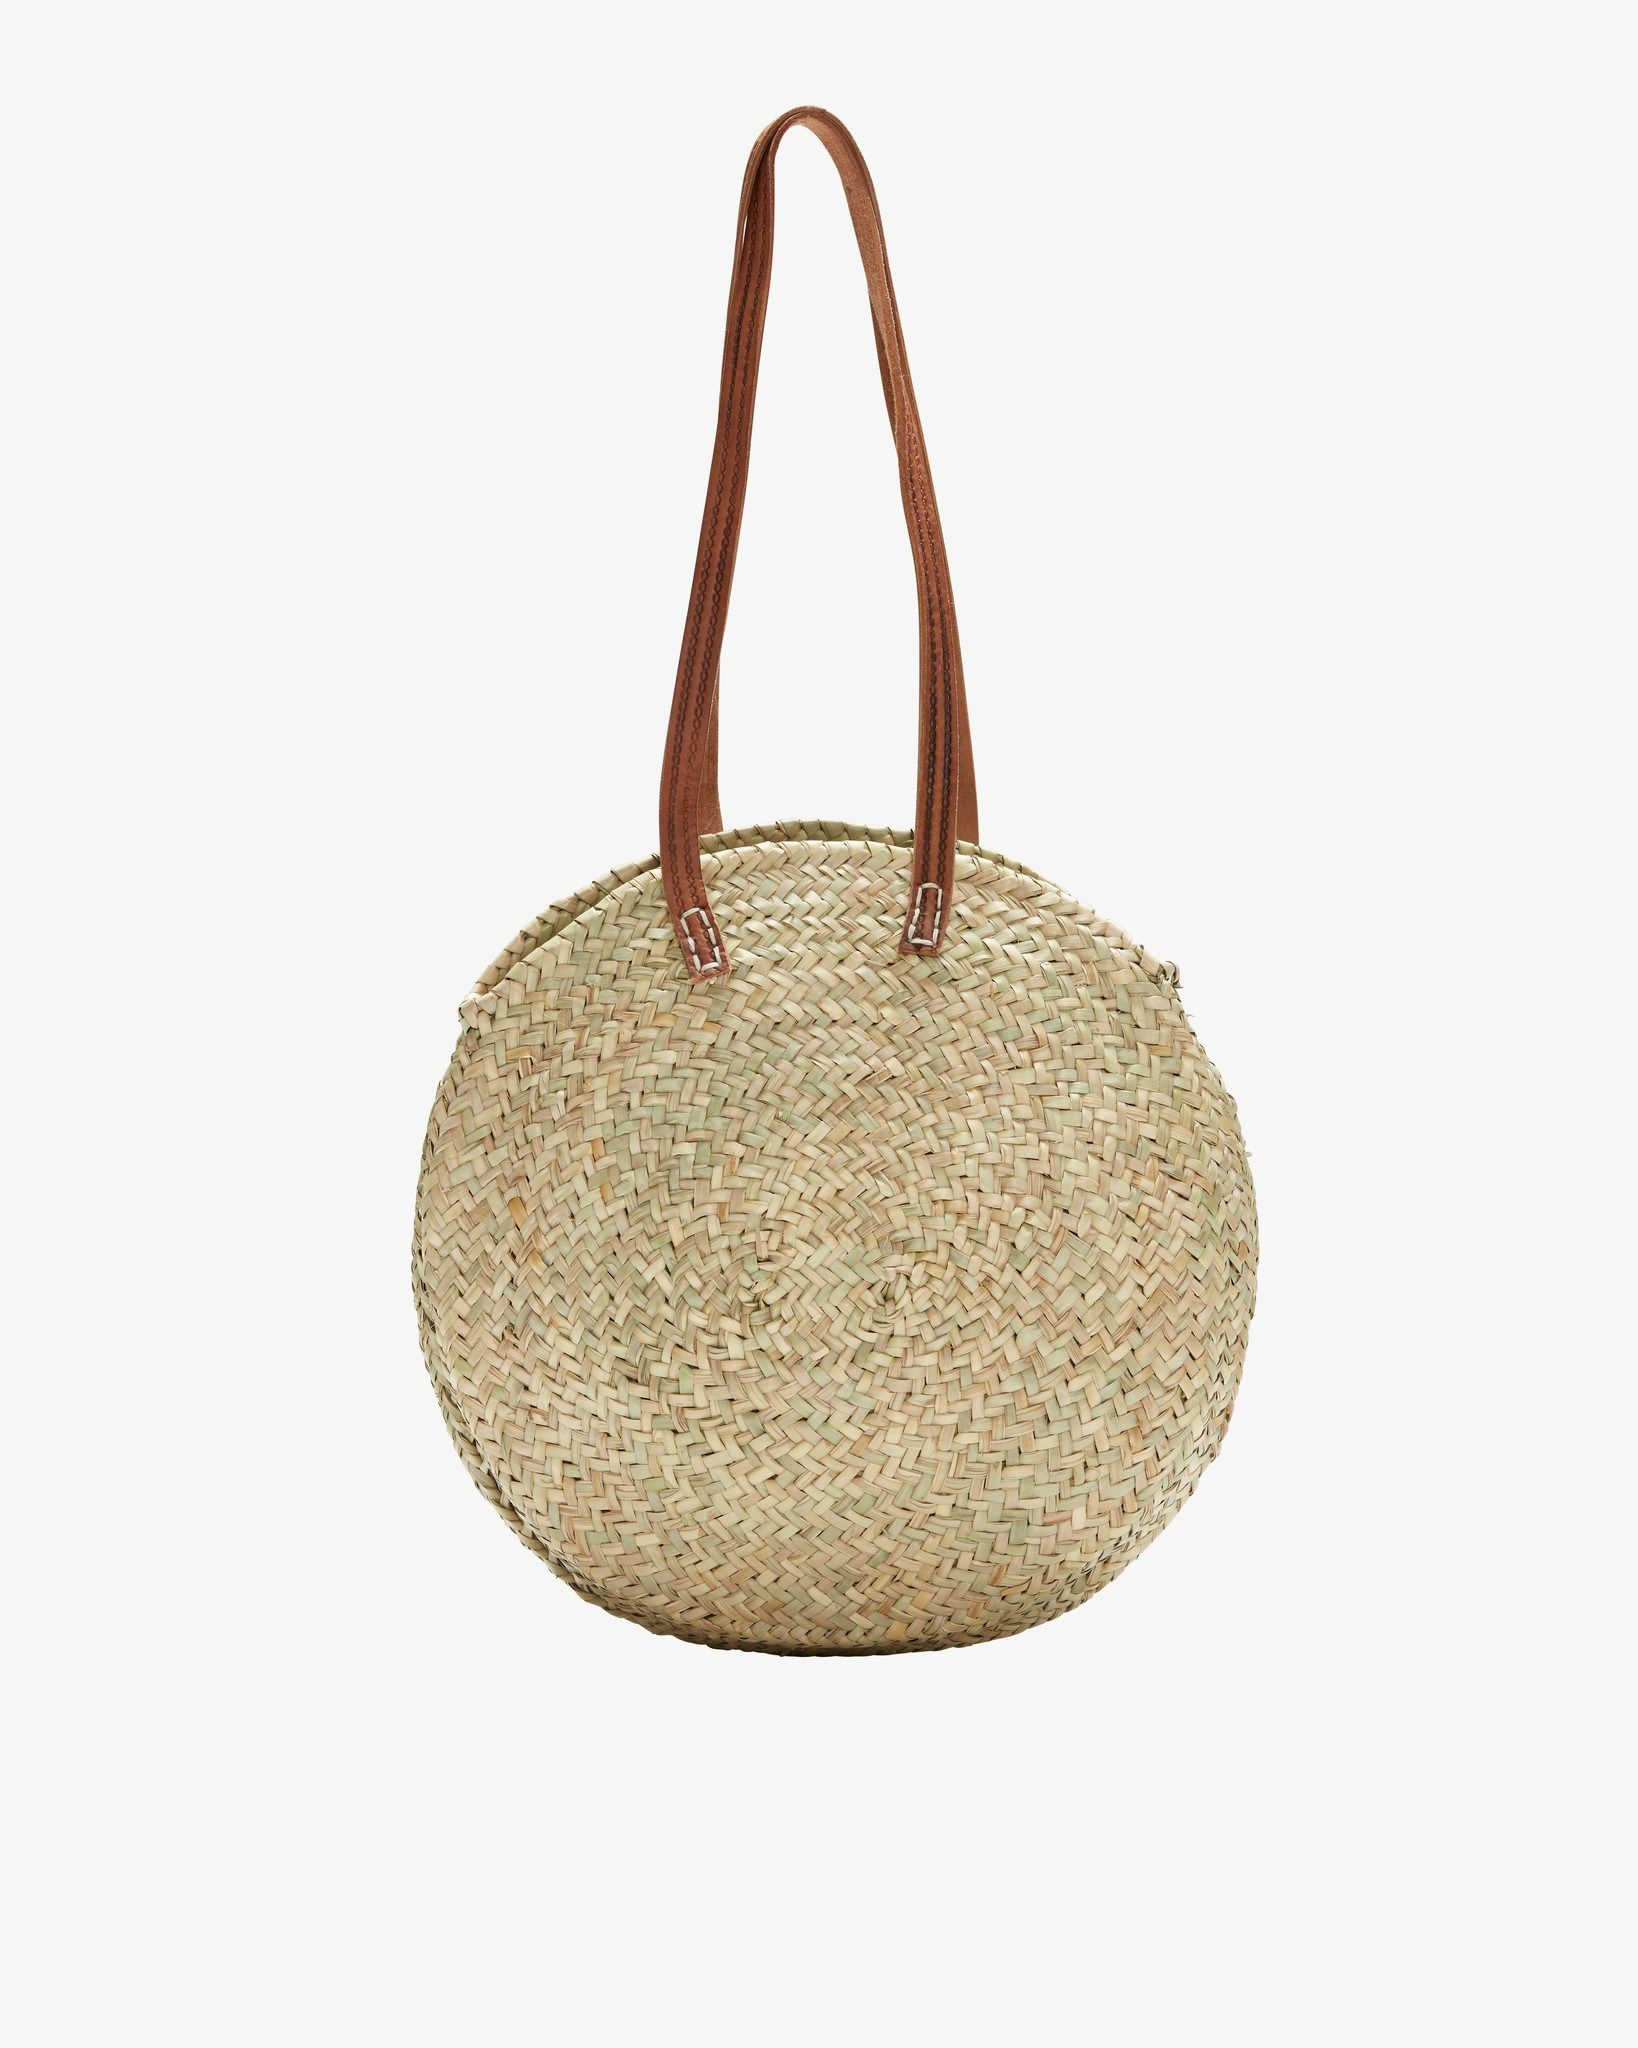 e936e687598c Oval Round Shopper Basket - Indigo&Lavender Tote Handbags, Clear Handbags,  Brown Handbags